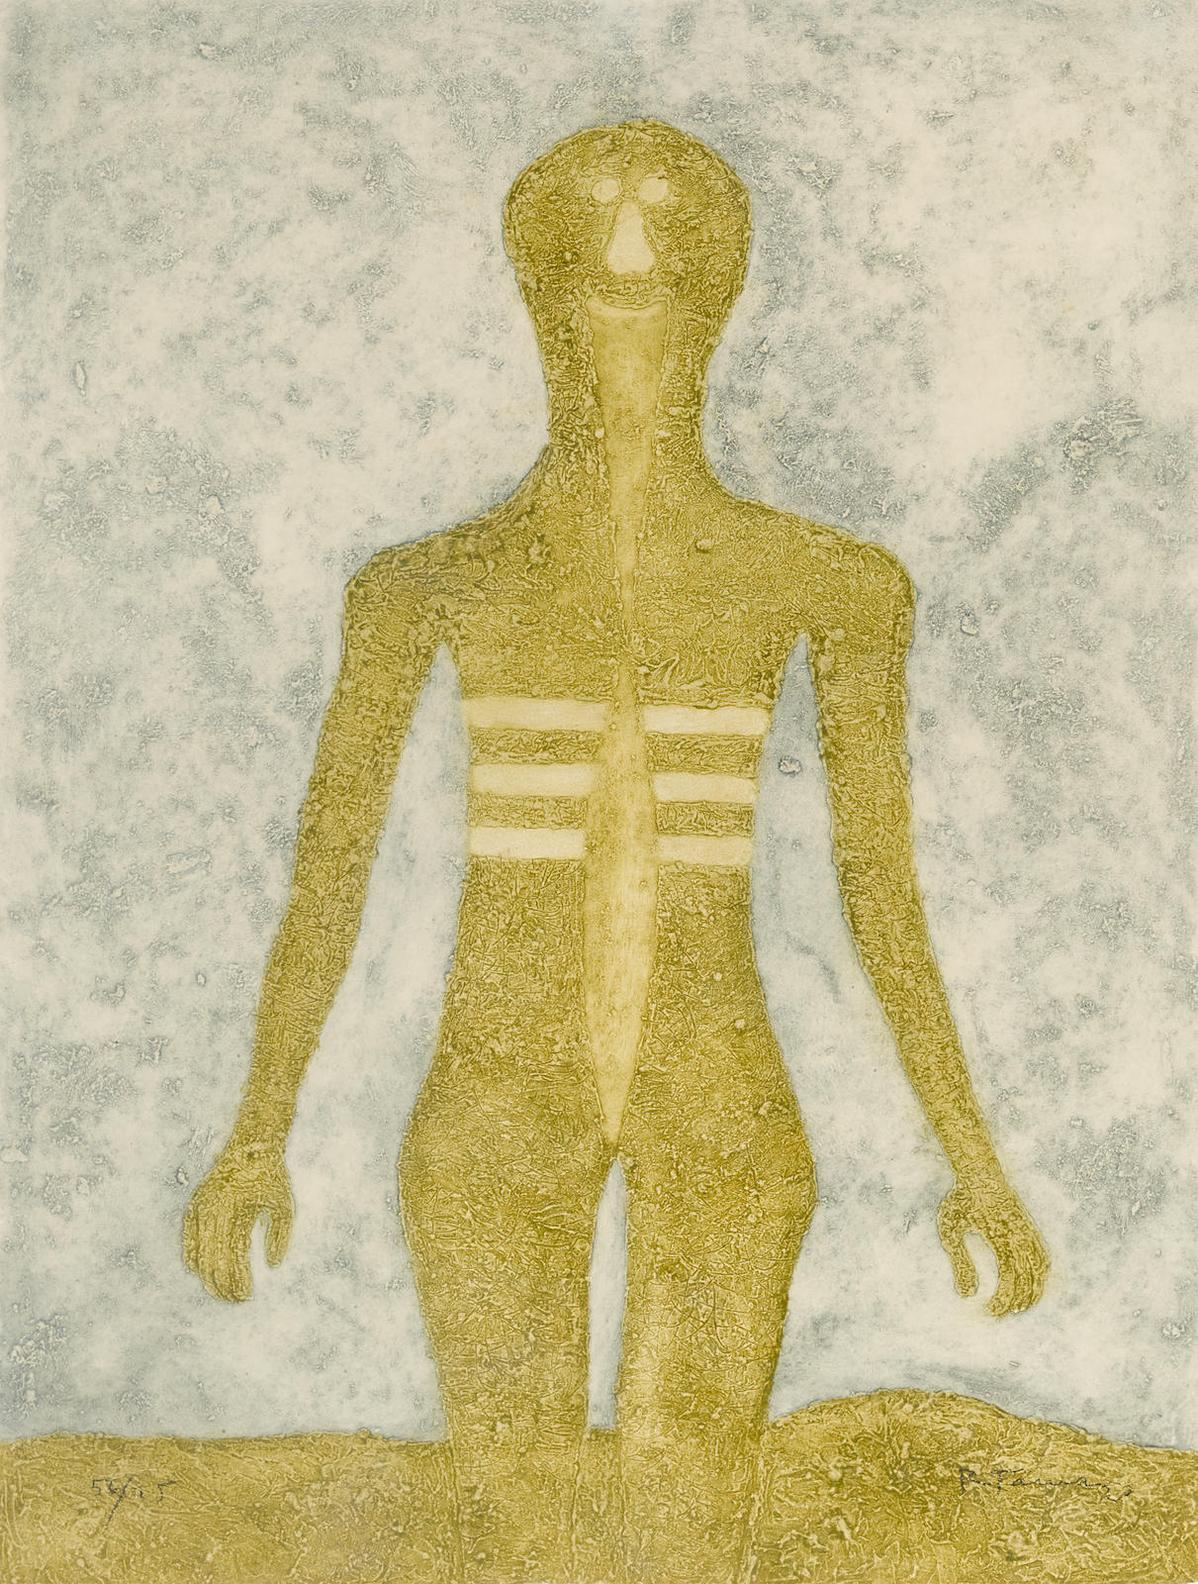 Rufino Tamayo-Figura En Ocre, From Rufino Tamayo 16 Aguafuertes-1976